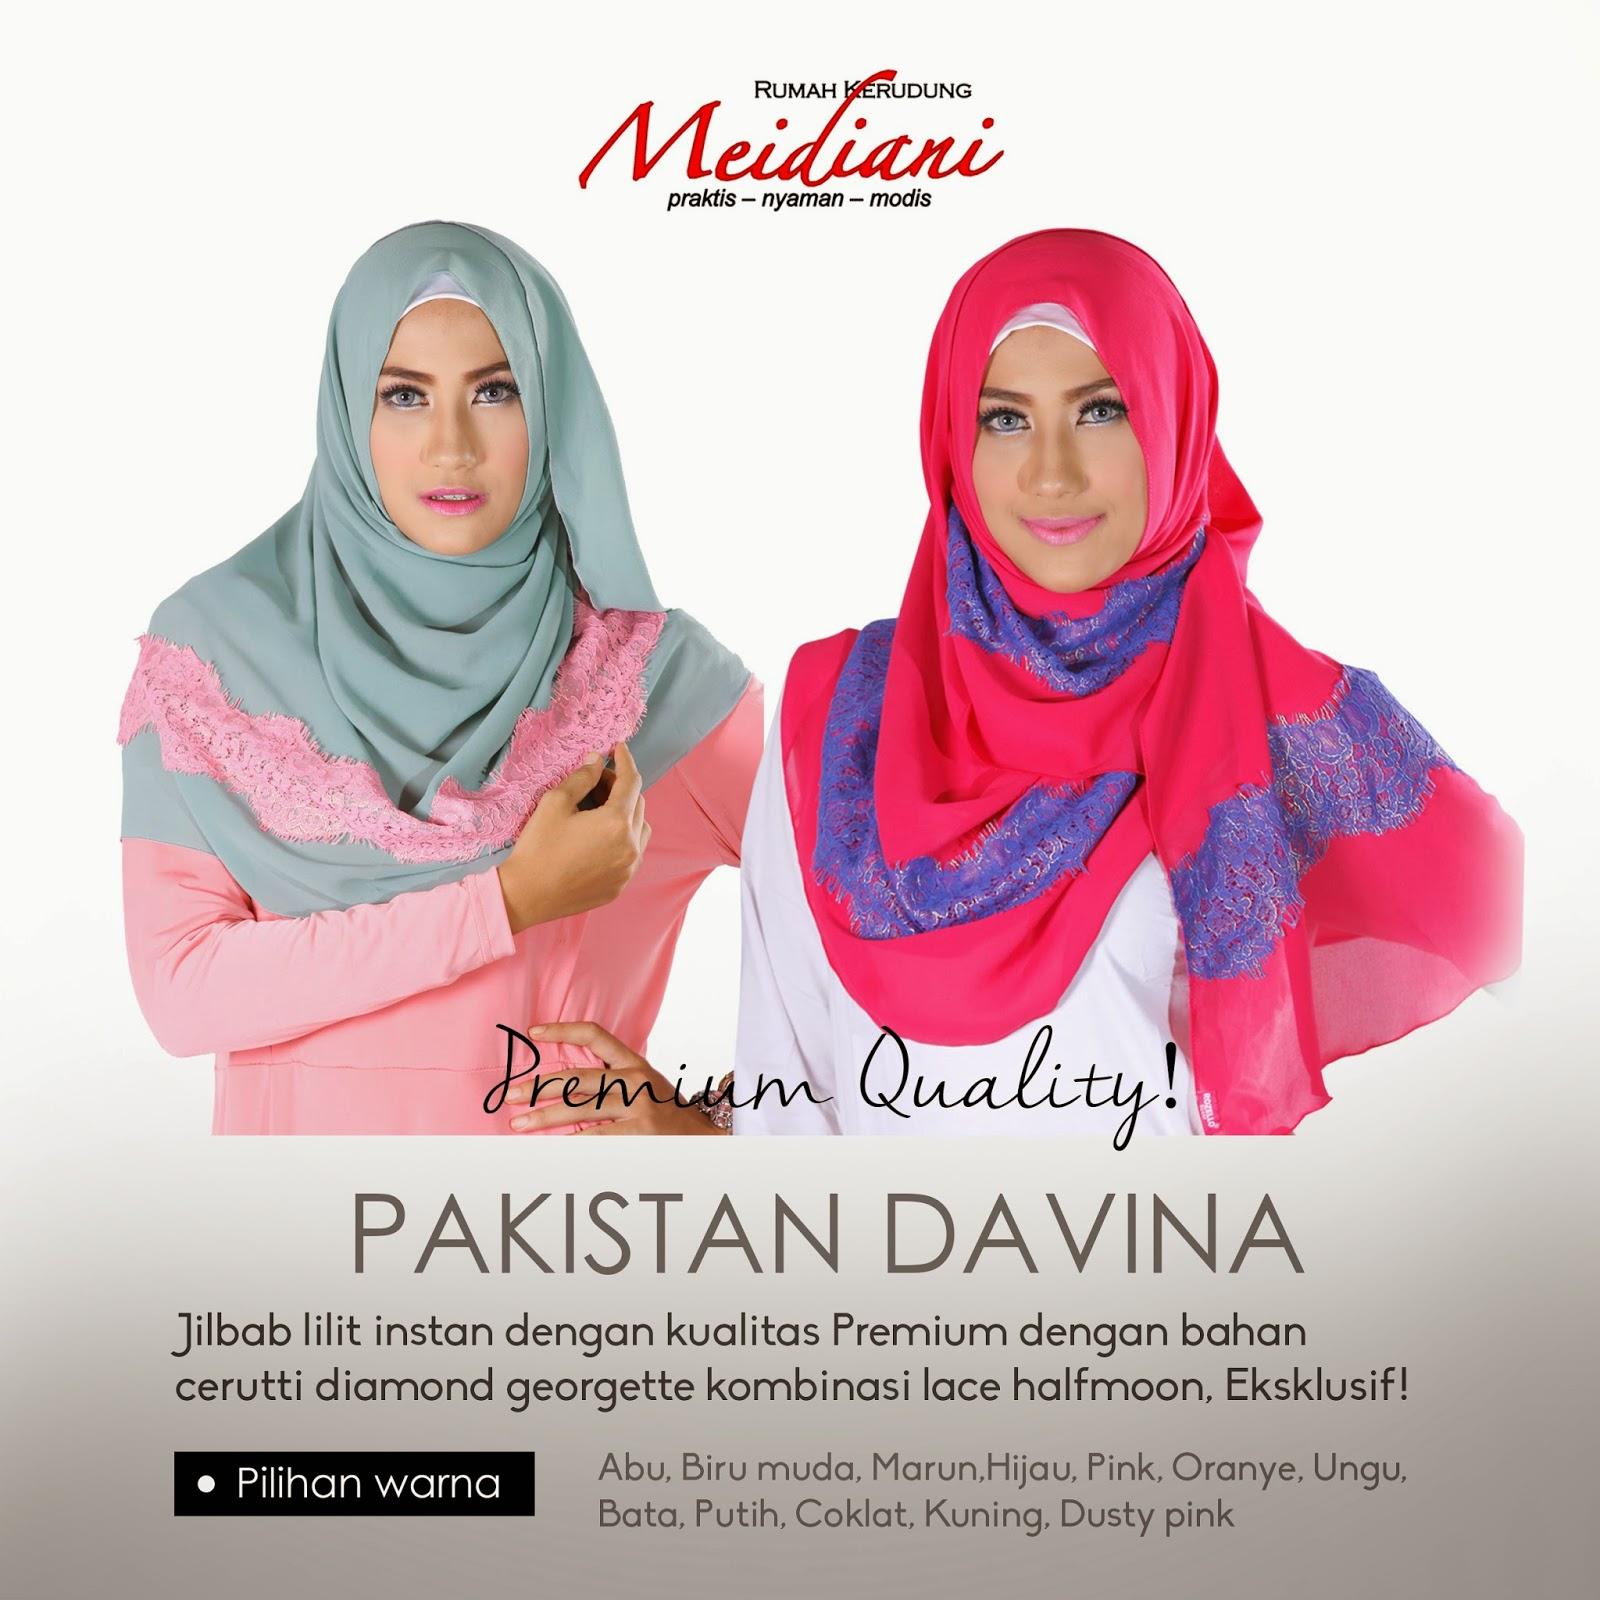 Pakistan Davina